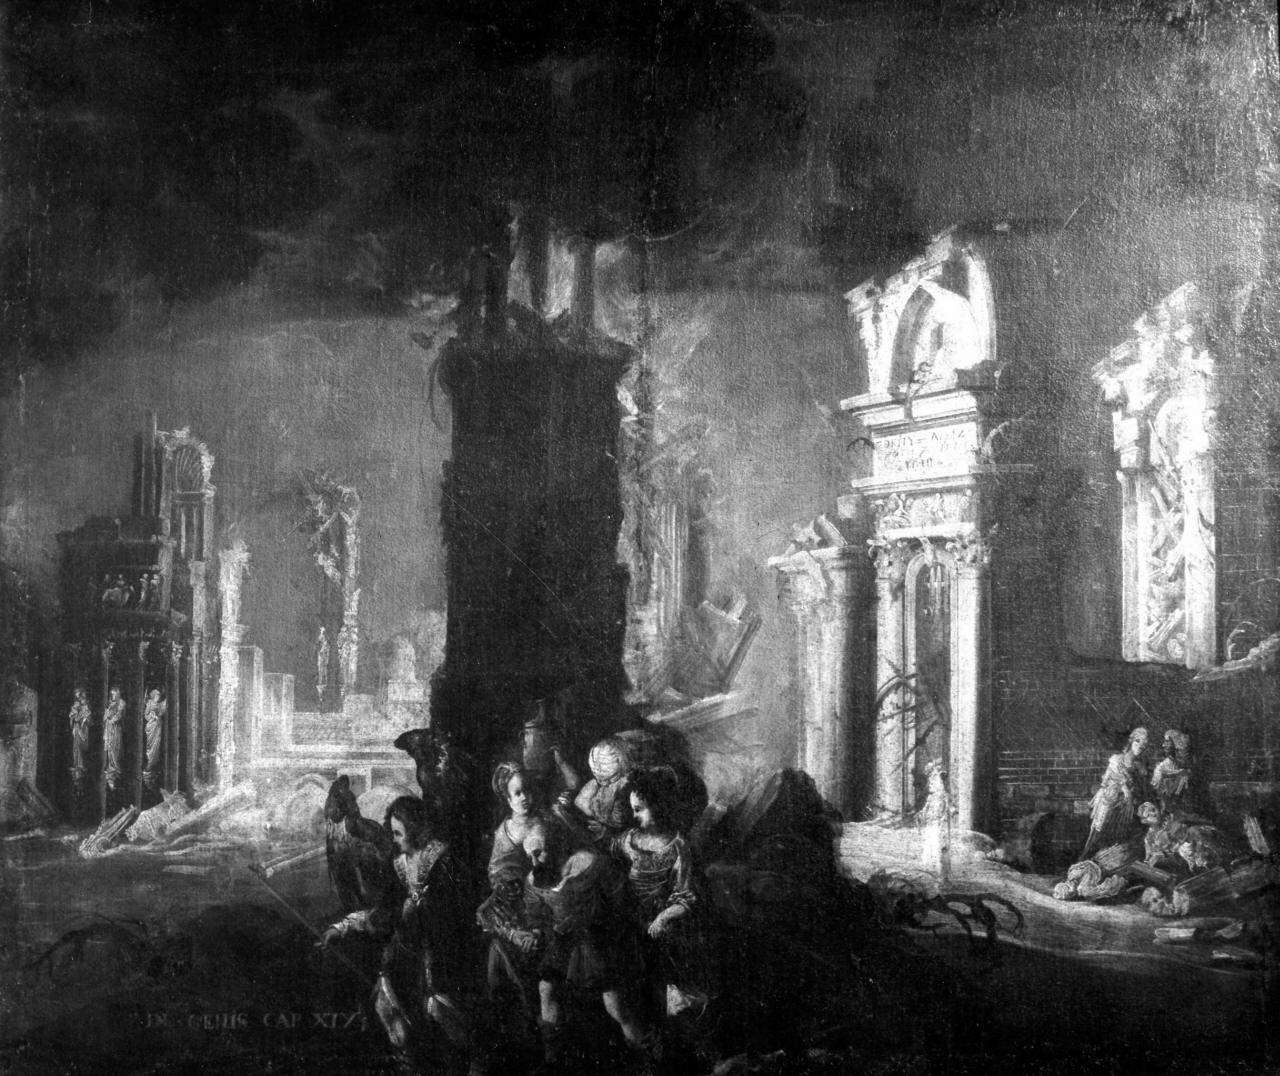 Loth fugge da Sodoma (dipinto) di De Nomé François Didier (attribuito) (sec. XVII)